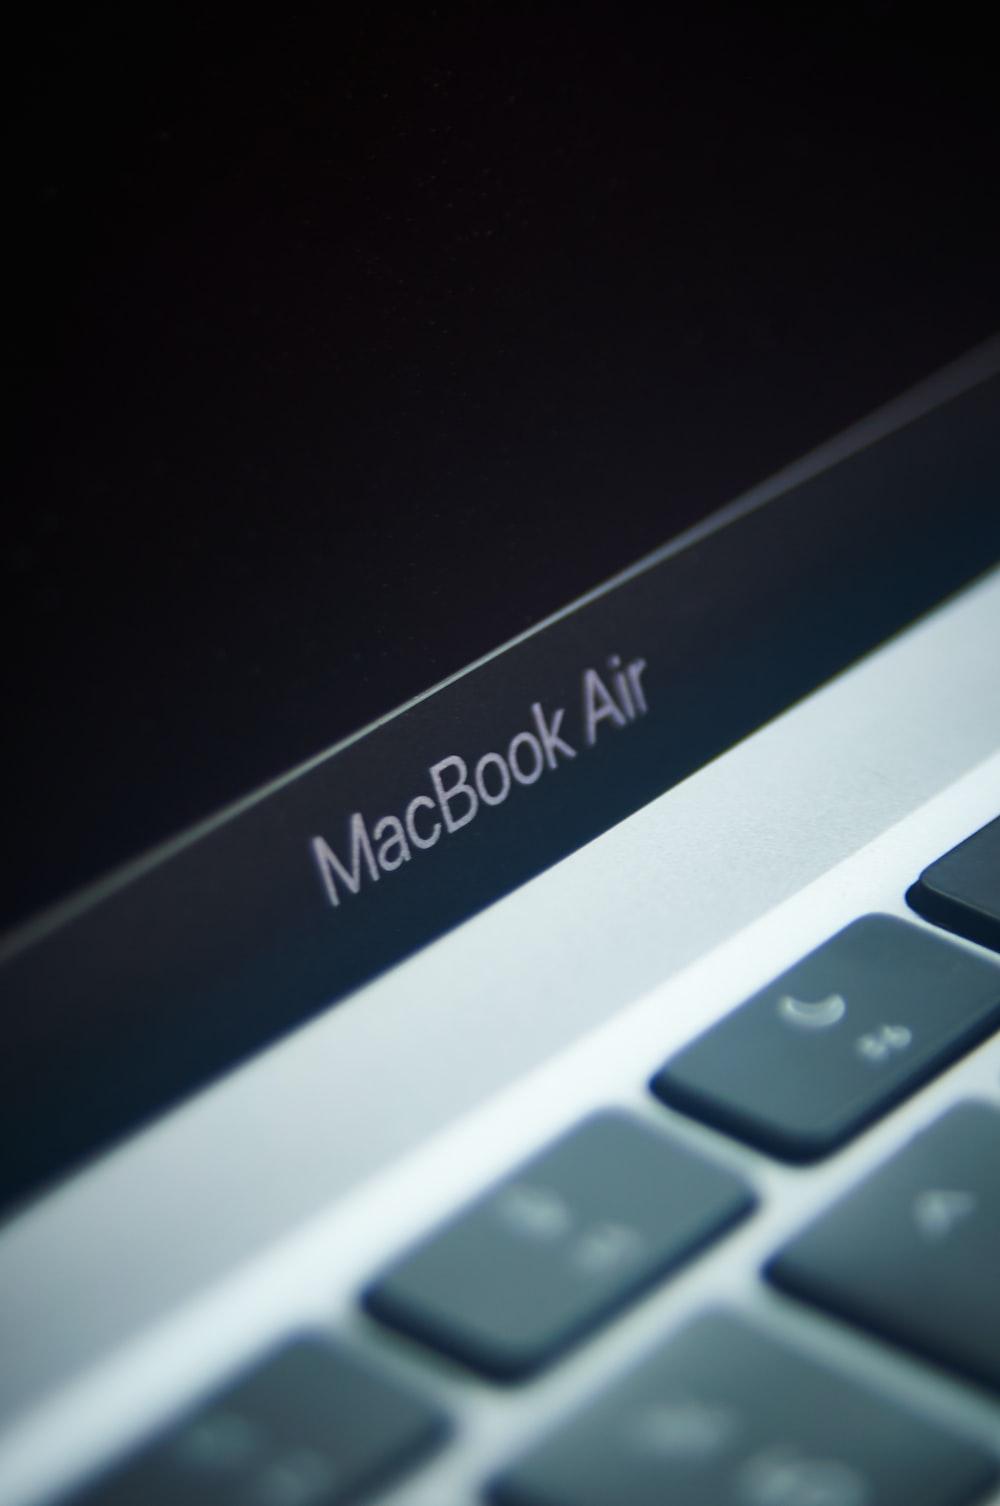 black and white lenovo laptop